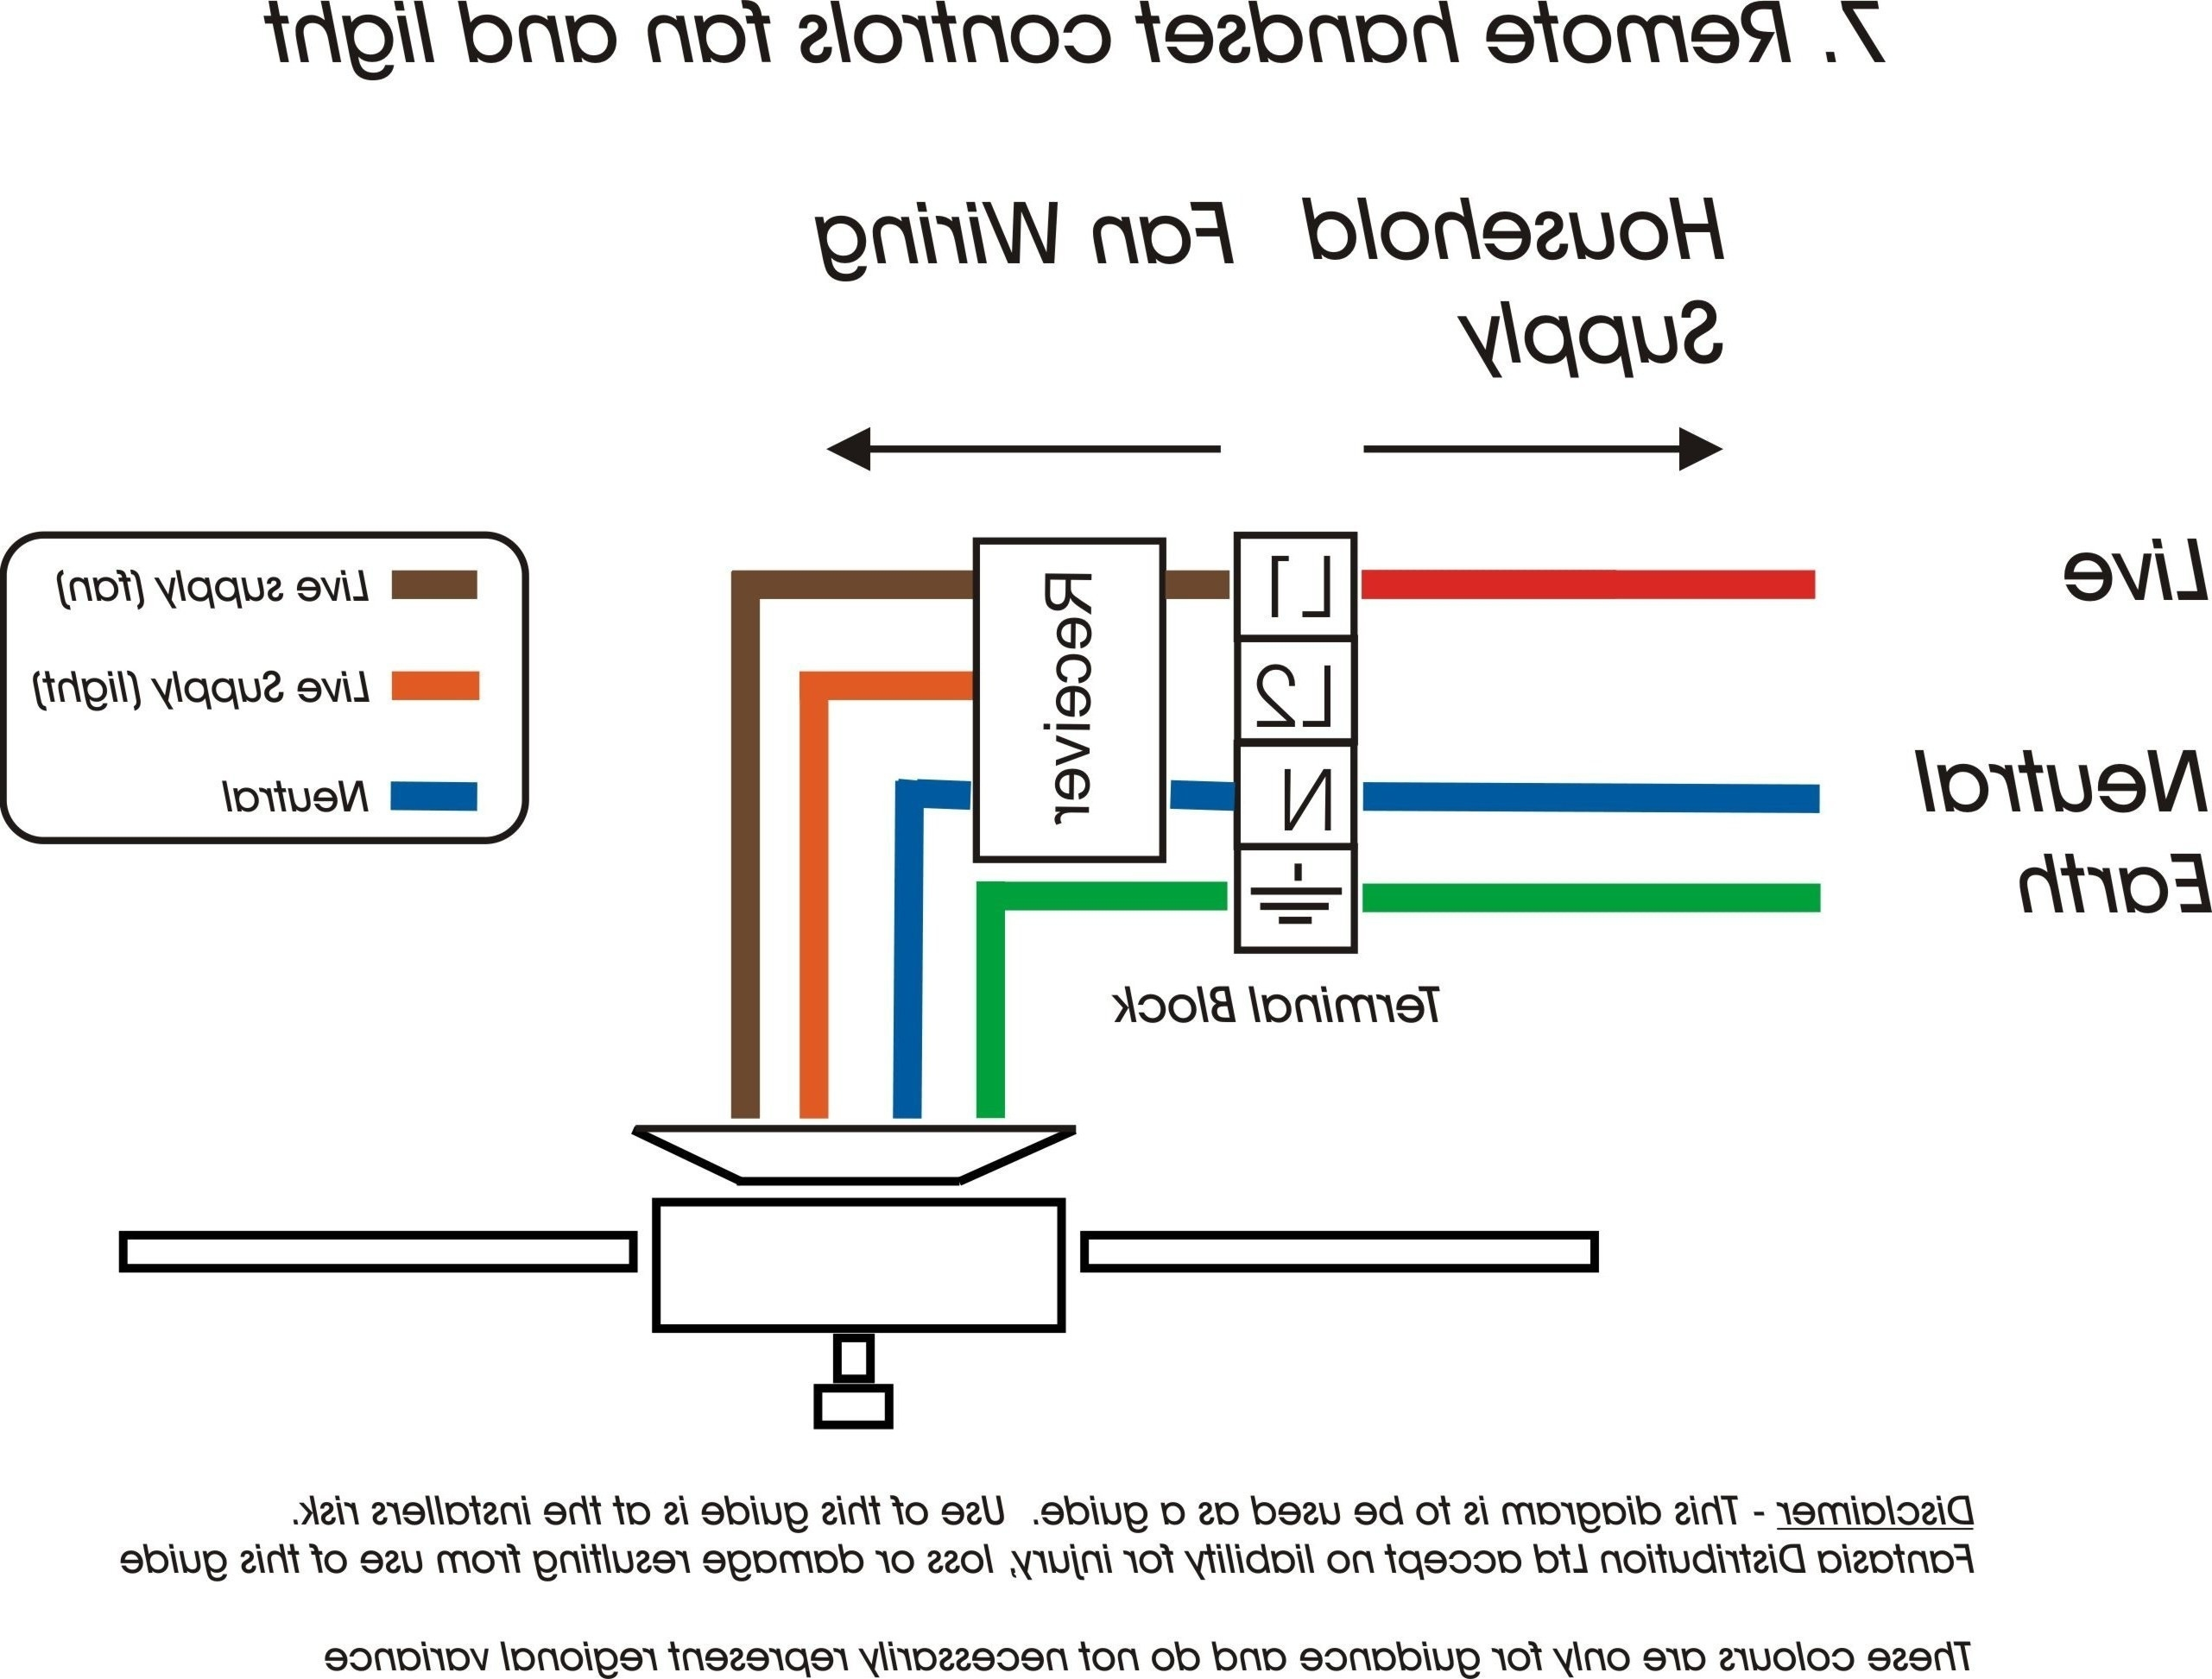 junction box wiring diagram Collection-Wiring Diagram For Lighting Junction Box Inspirational Wiring Diagram For Garage Lighting Best Wiring Diagram Garage Lights 4-m